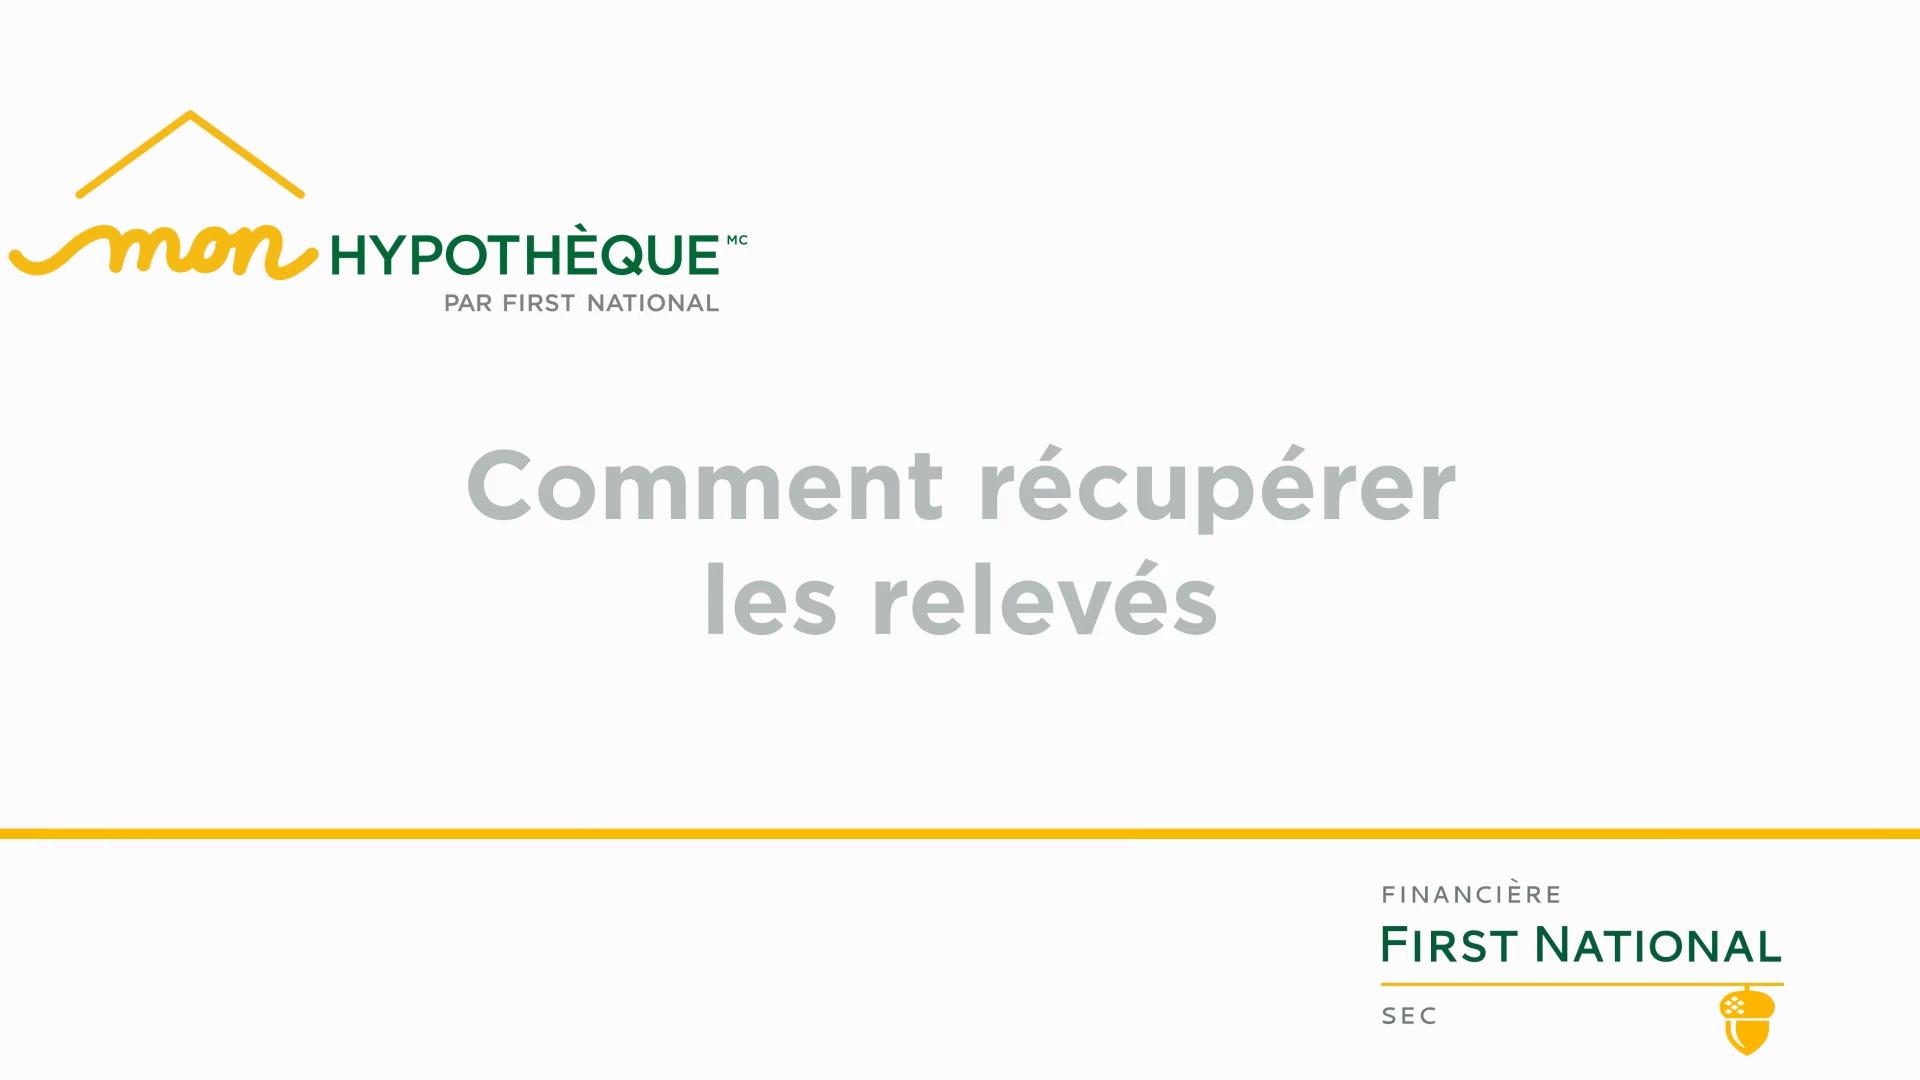 Retrieving Mortgageg Statements_FR